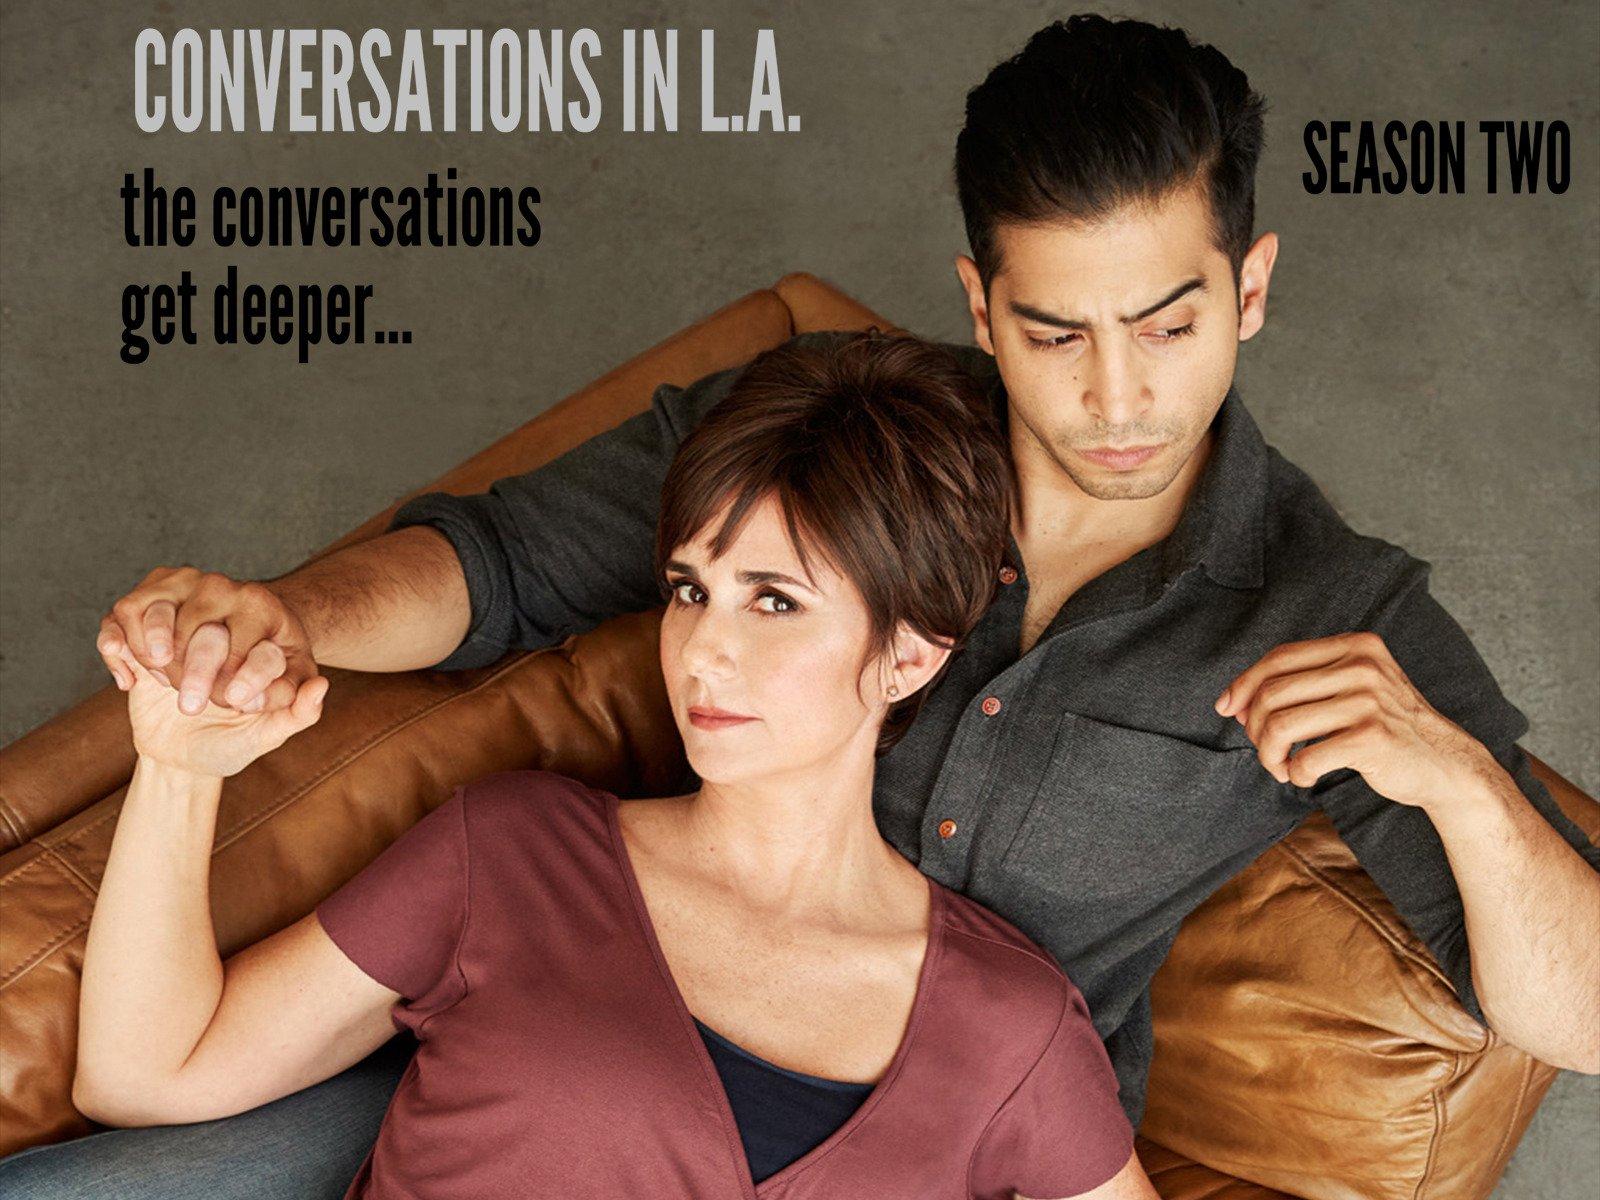 Conversations in L.A. - Season 2